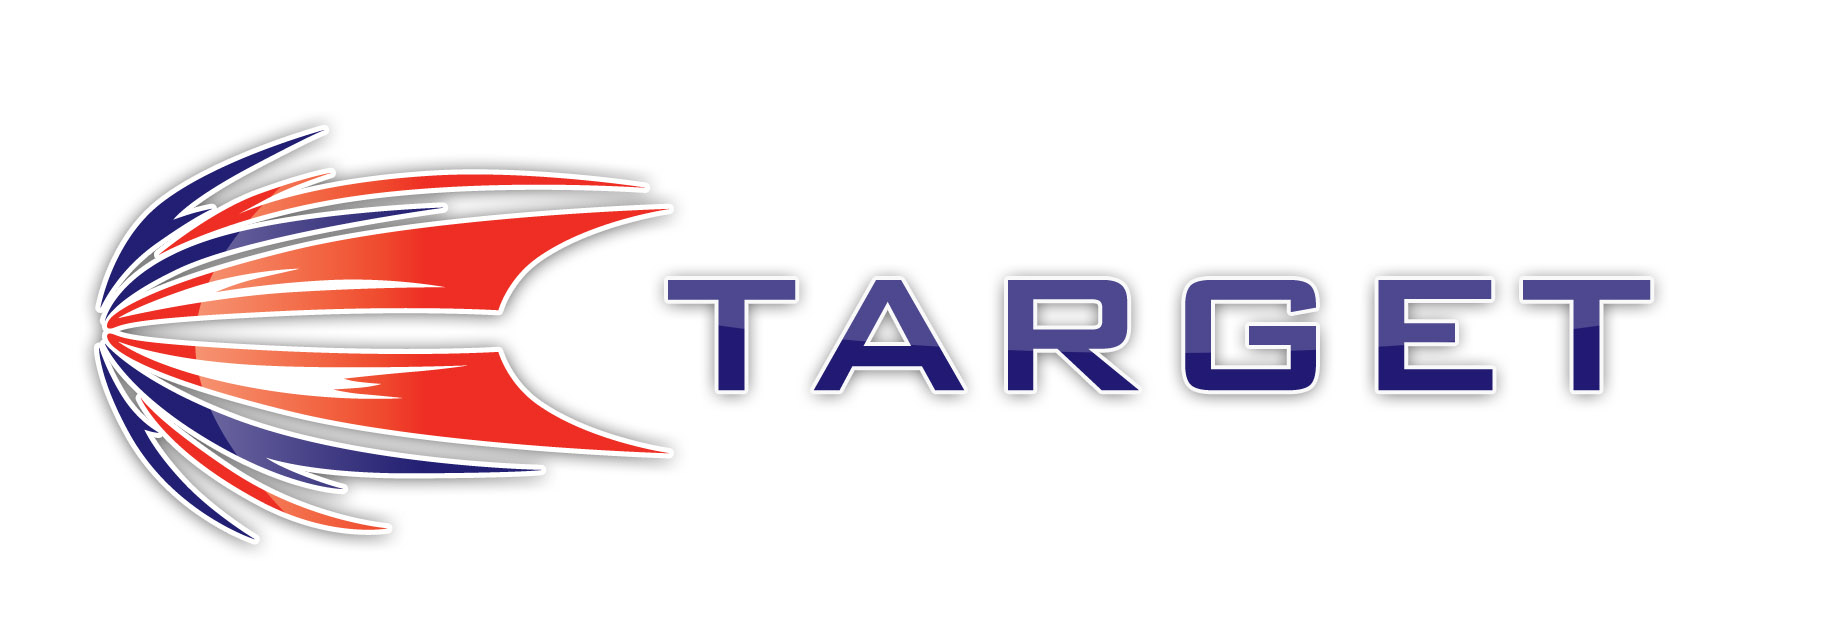 target-logo-blue.jpg